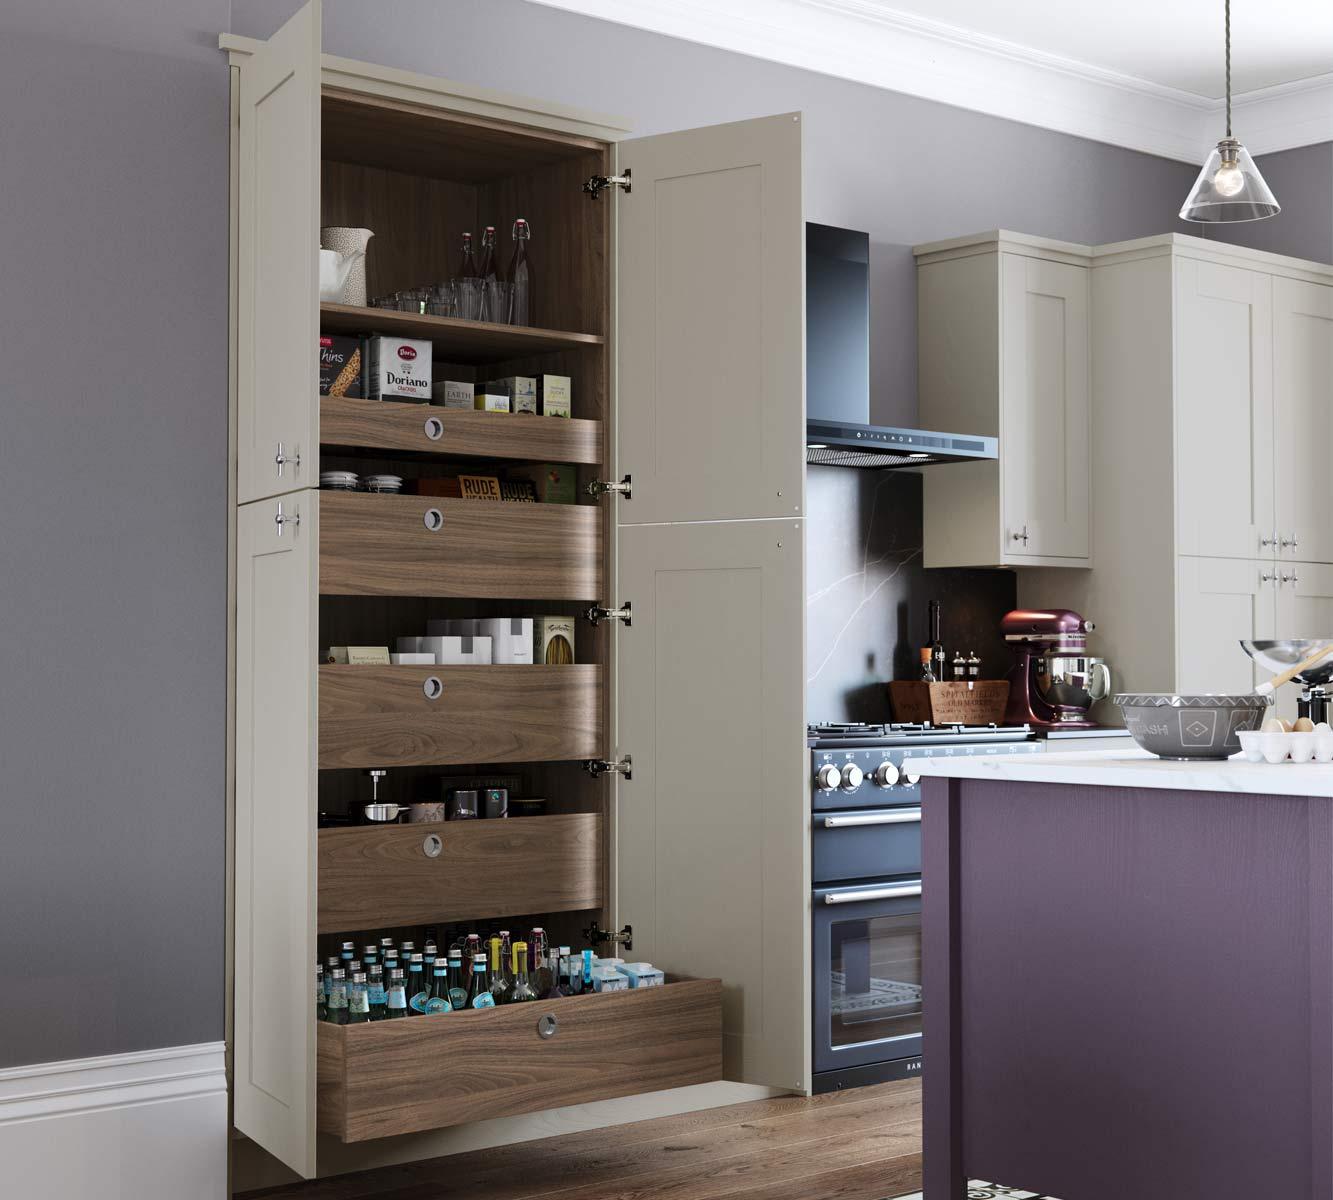 Masterclass Kitchens Blackburn Lancashire sherborne mulberry highland stone space tower